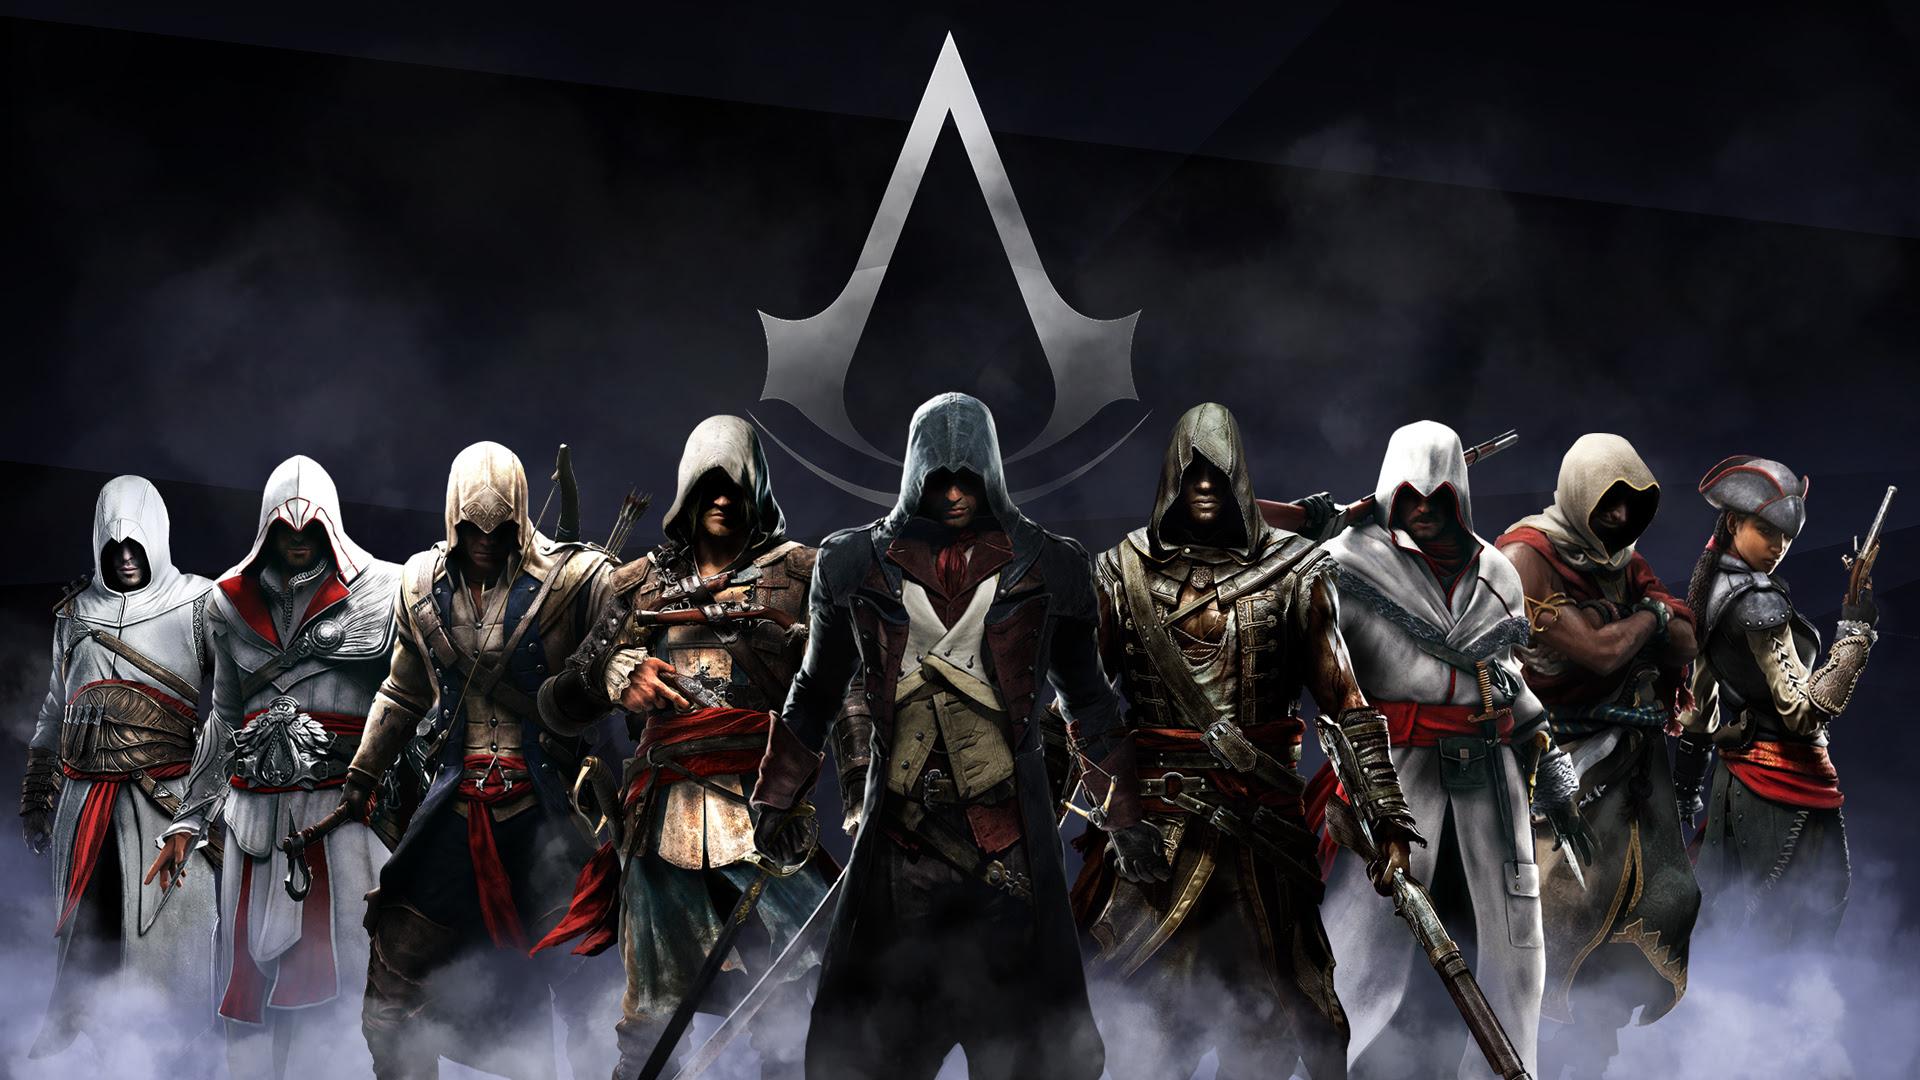 Assassin Creed Unity Wallpaper